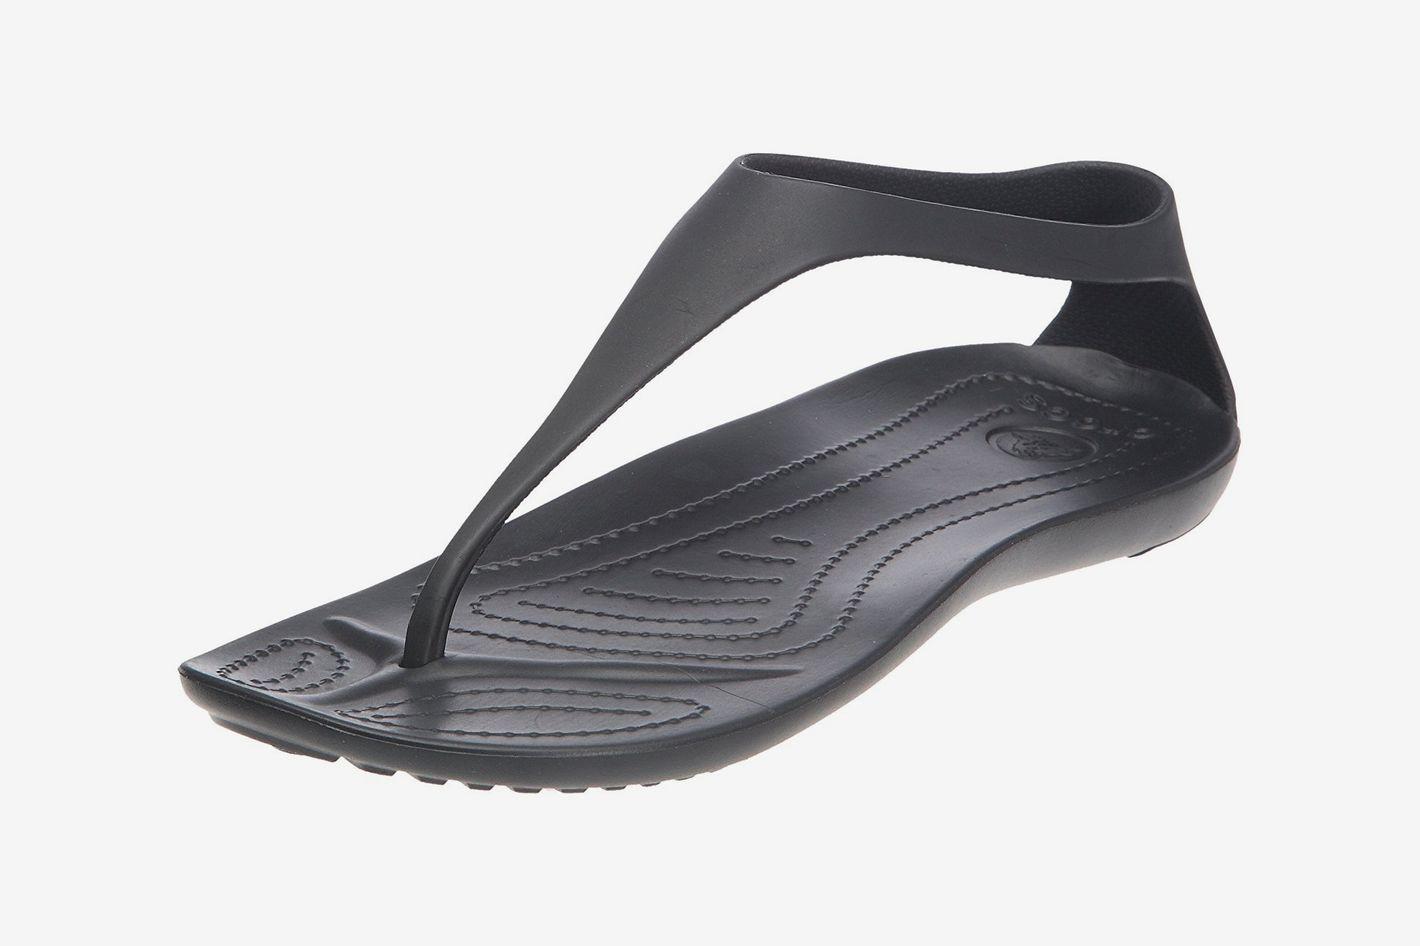 7c4646978e69 11 Best Women s Sandals 2018 — Flip-flops